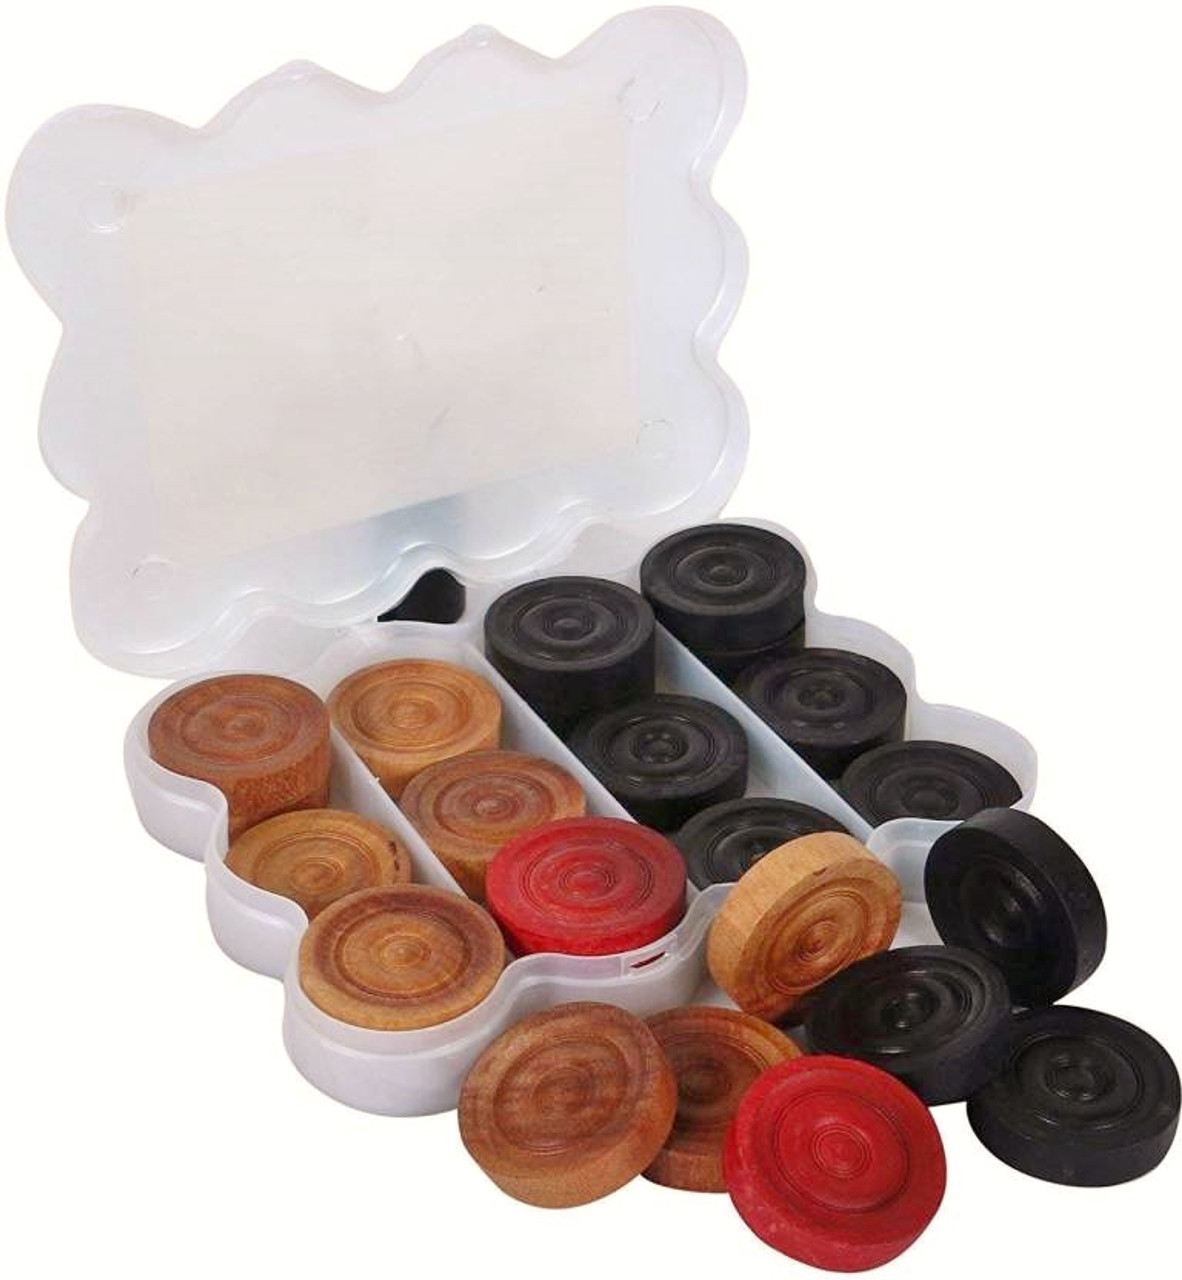 Carrom Championship Coin Set  Regulation Approved PLUS FREE BONUS OFFER